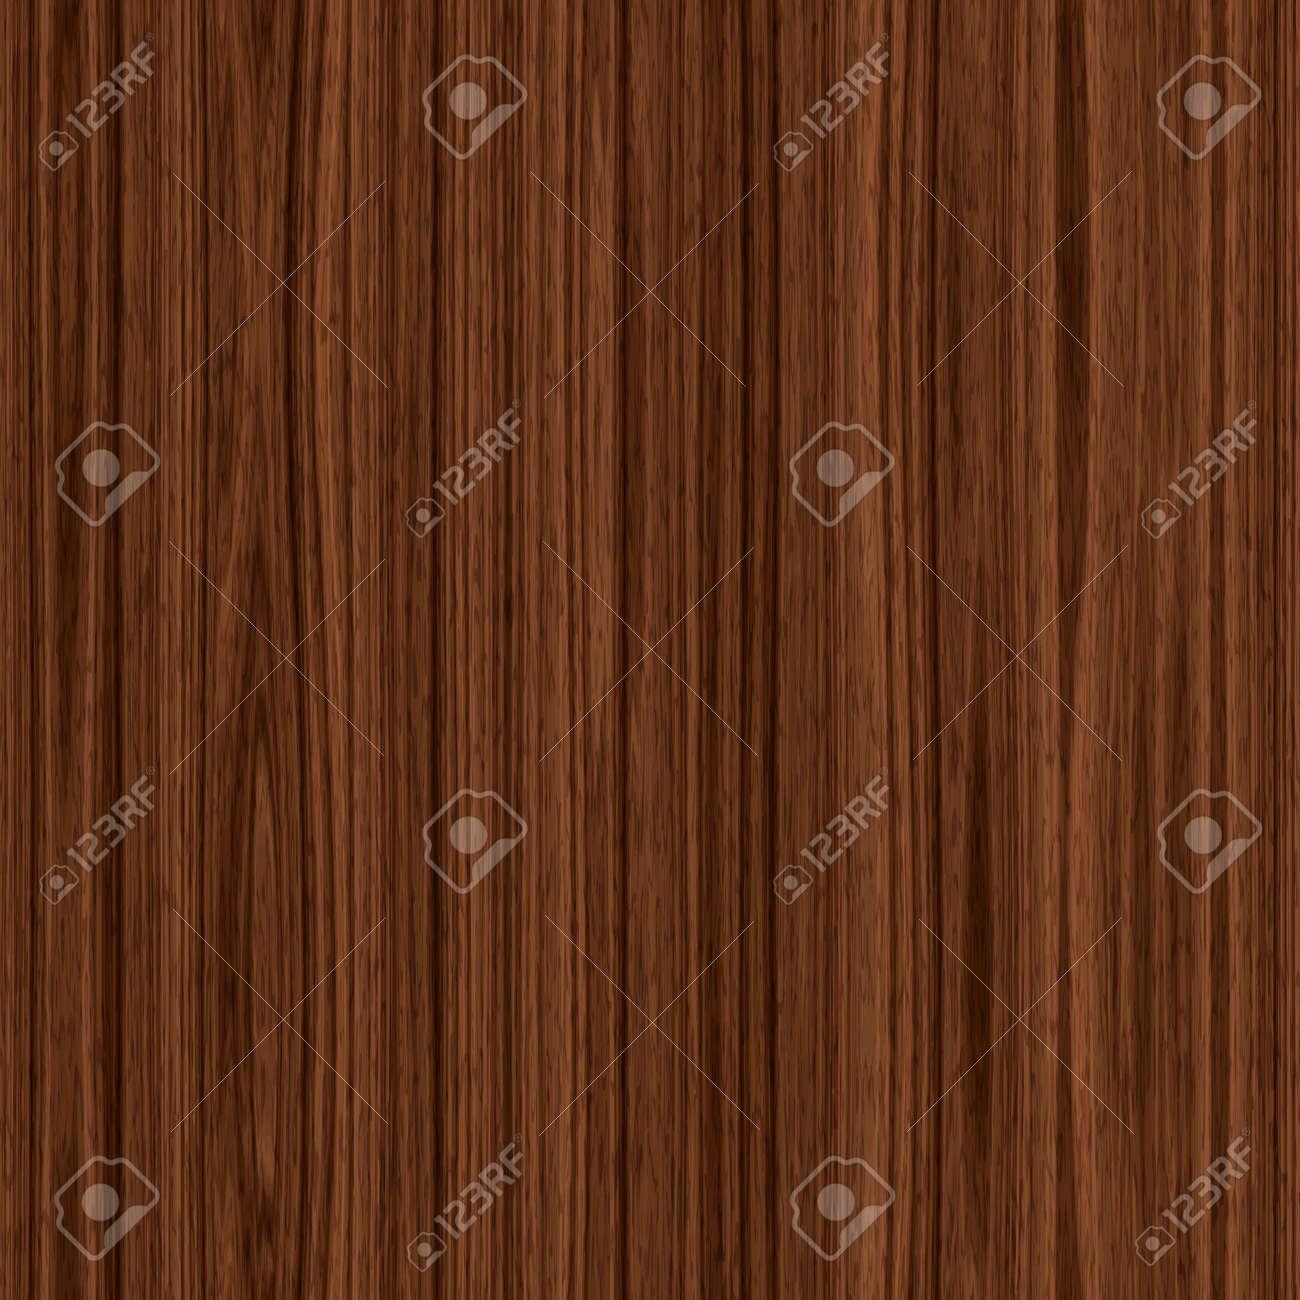 La Alta Calidad De Madera De Alta Resolución Textura Perfecta. Parte ...